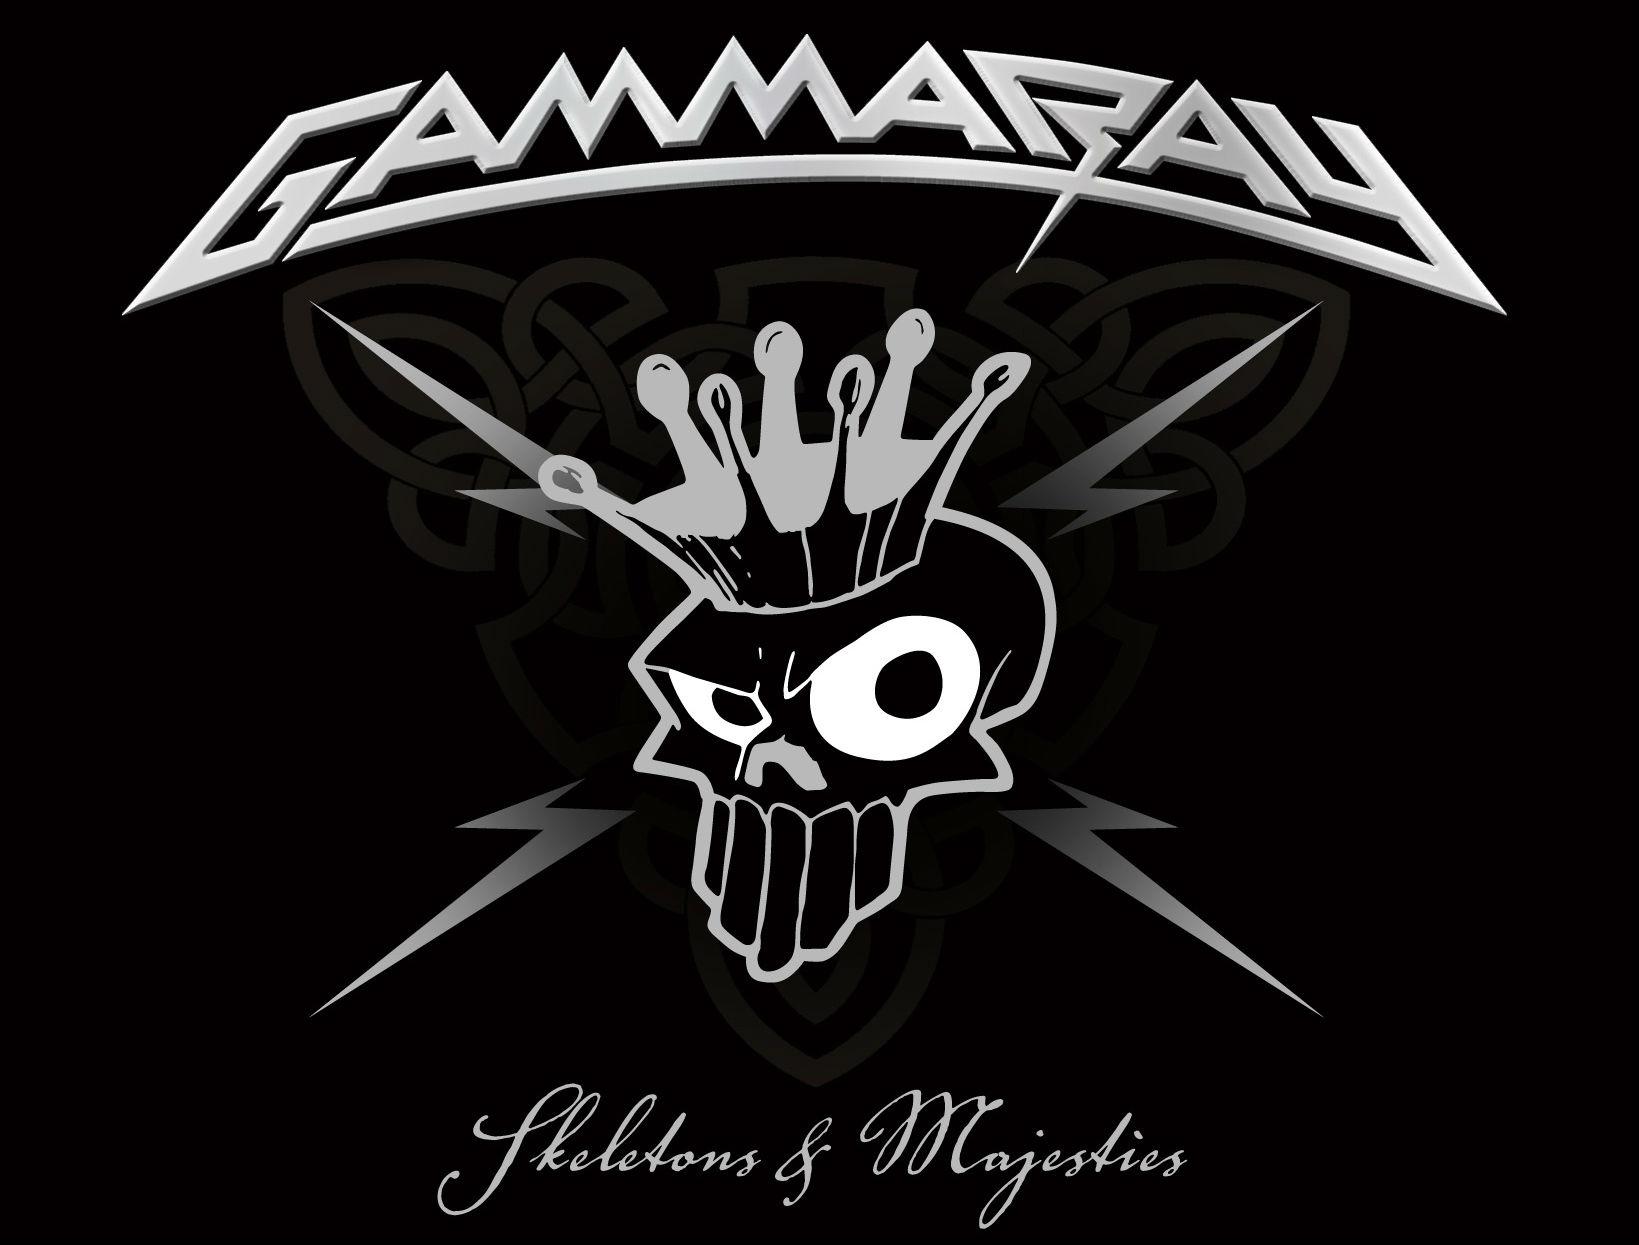 Gamma Ray Power Metal Heavy Album Art Cover Dark He Wallpaper